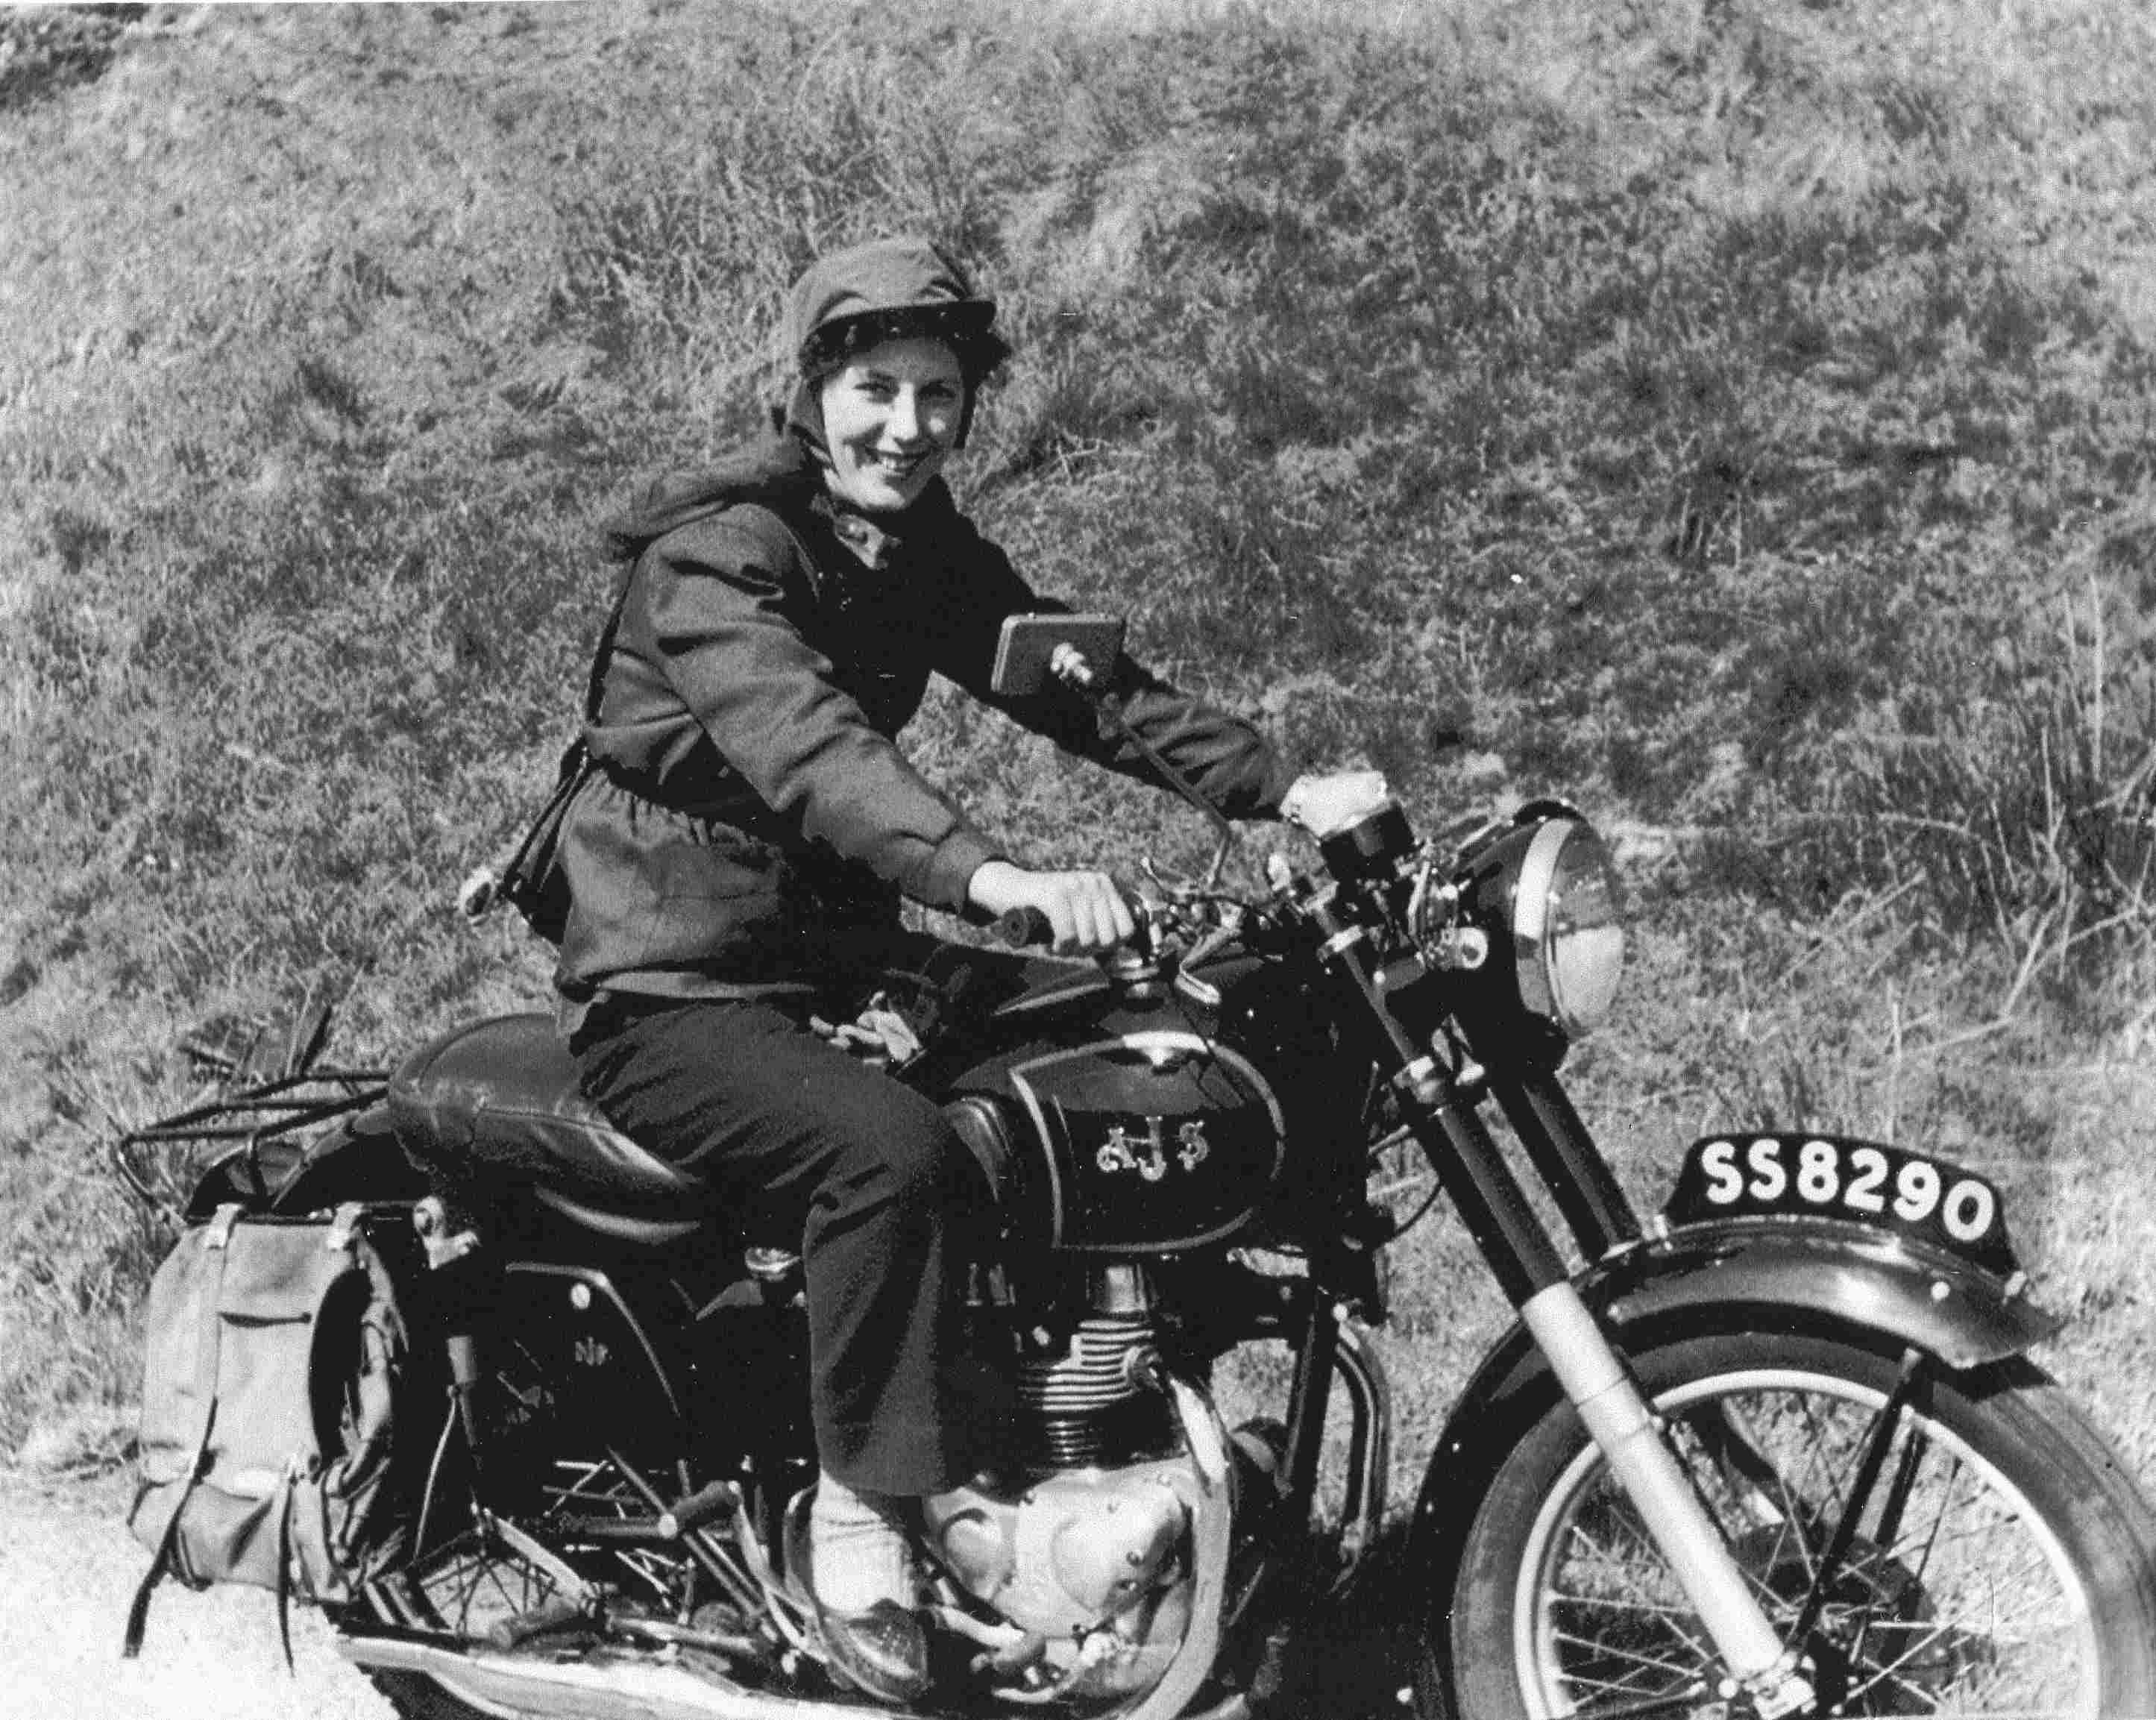 Woman On Motorbike 1960s